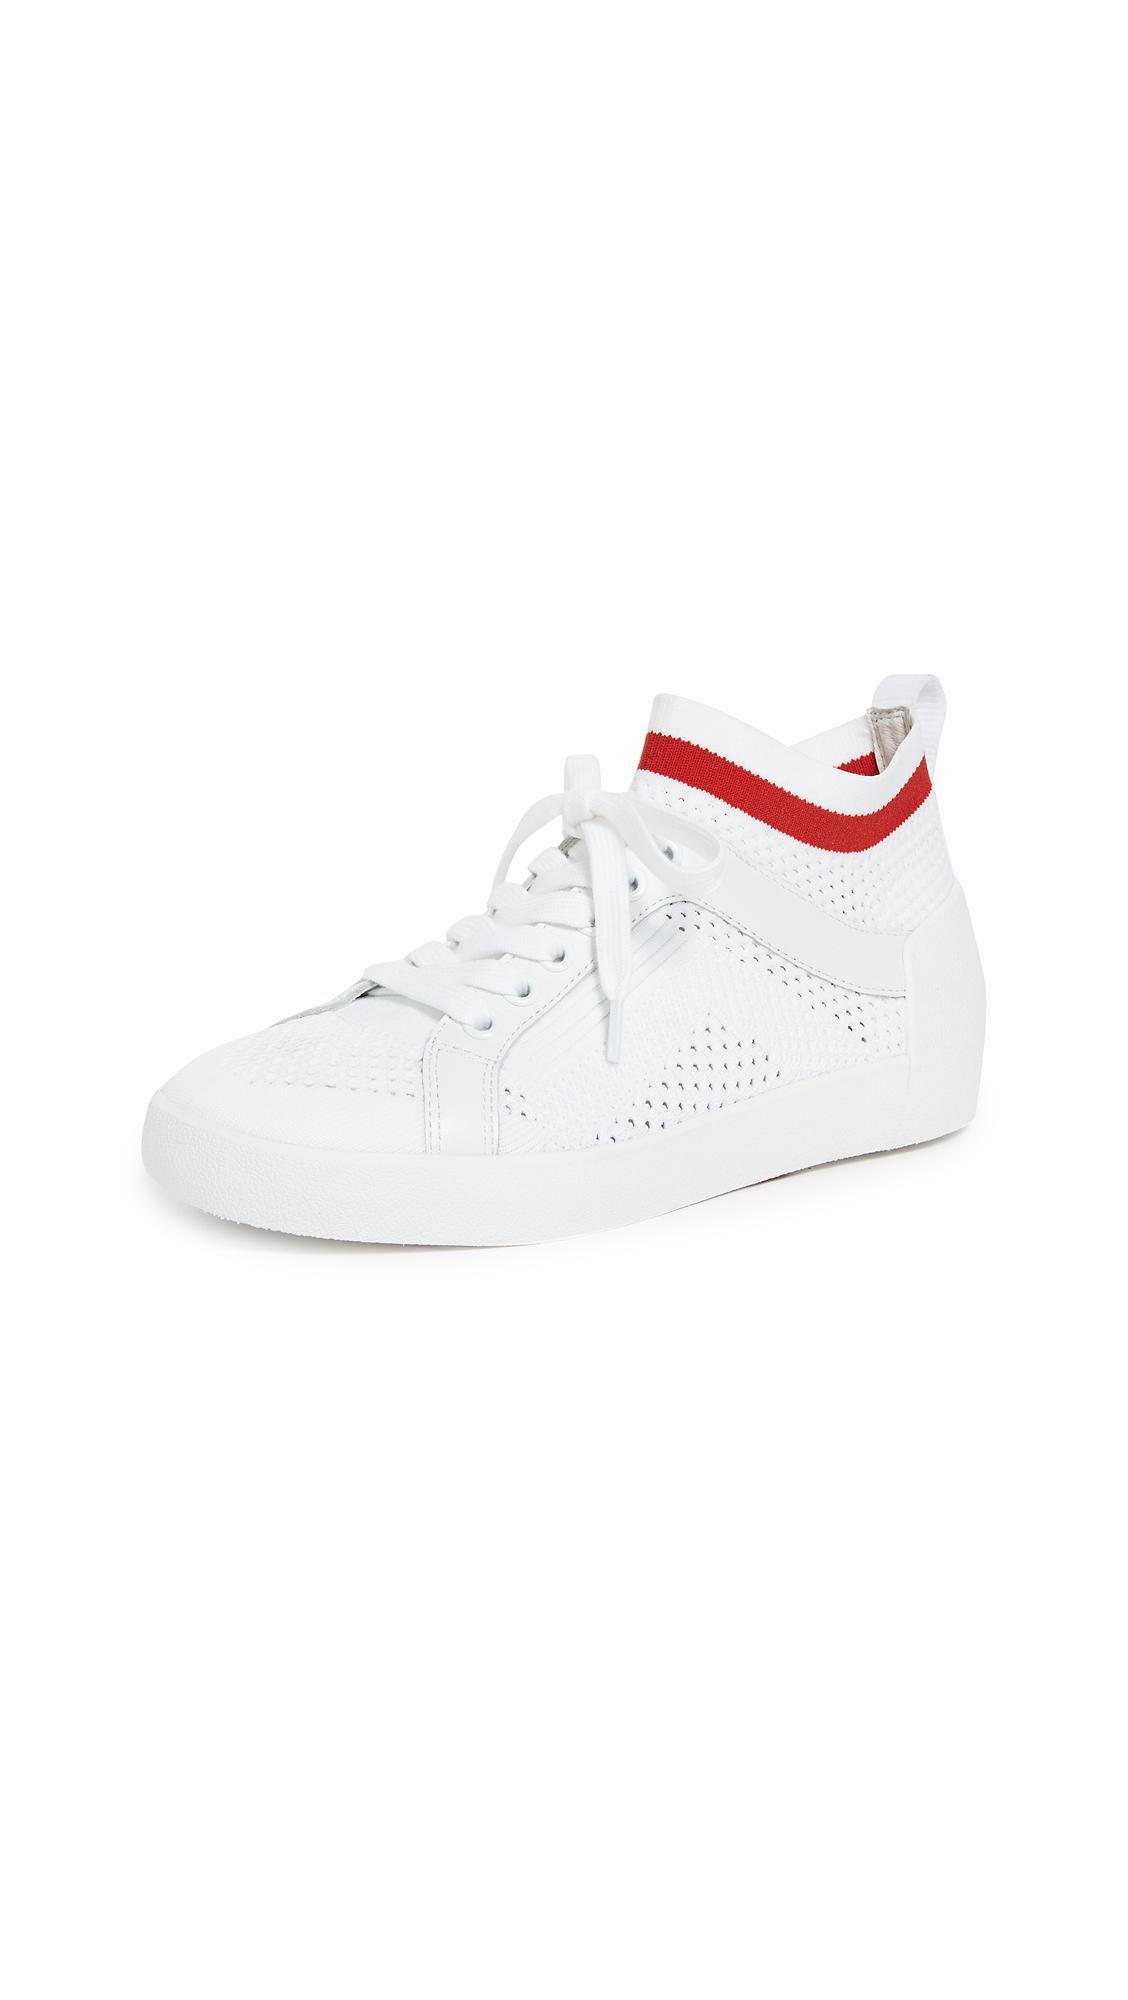 Ash Nolita Sneaker - White/Red